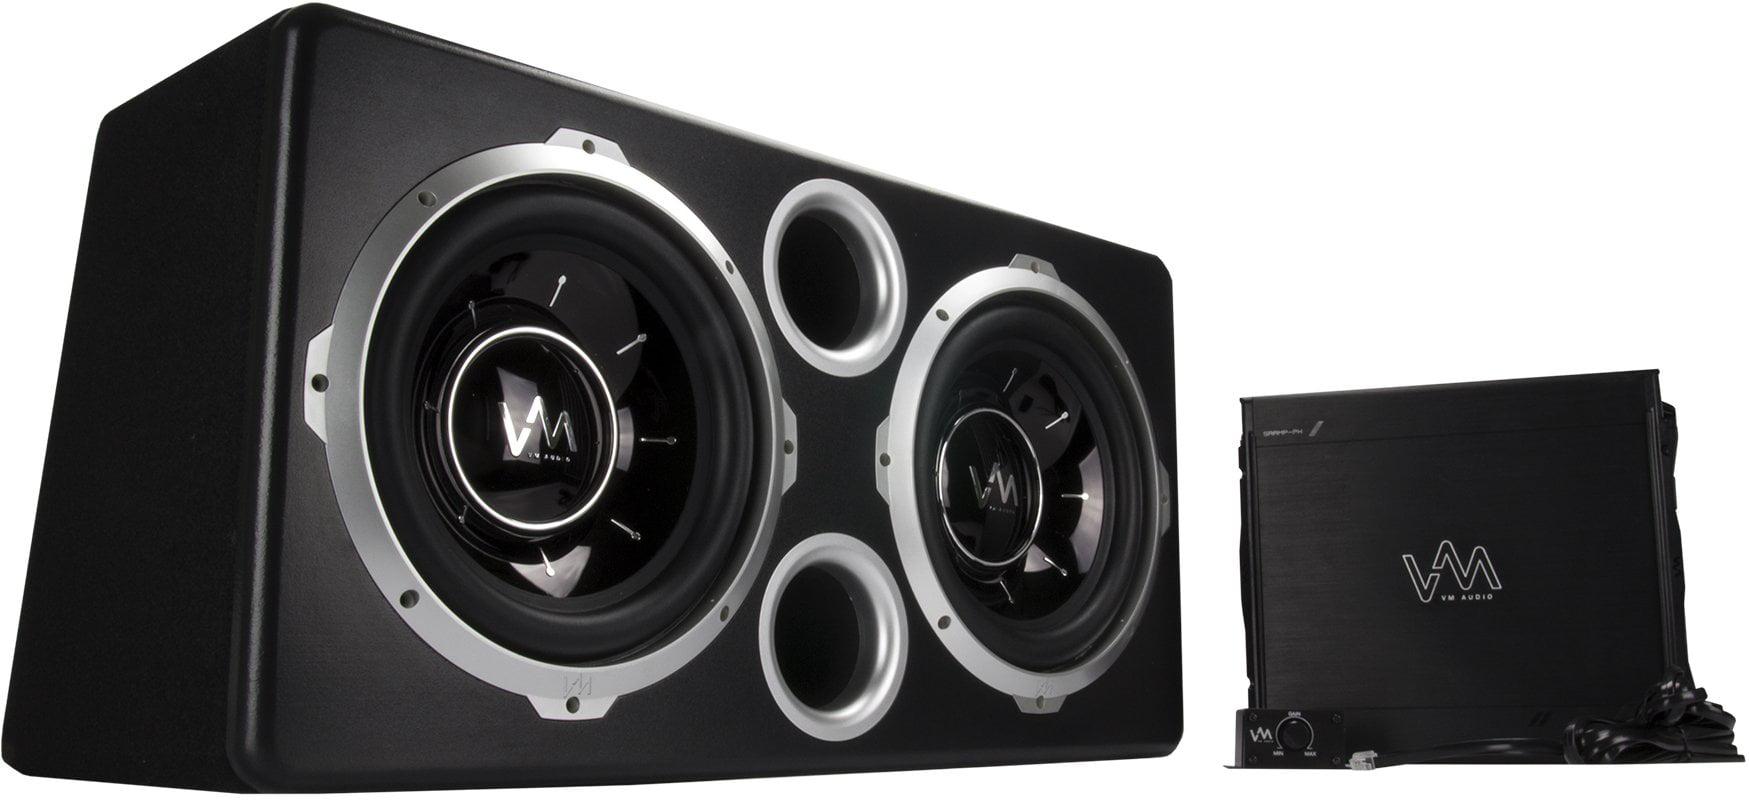 Vm Audio Dual 12 Vented Port 2000 Watt Sub Car Box Bass Package W Wiring Subwoofer Speakers Amp